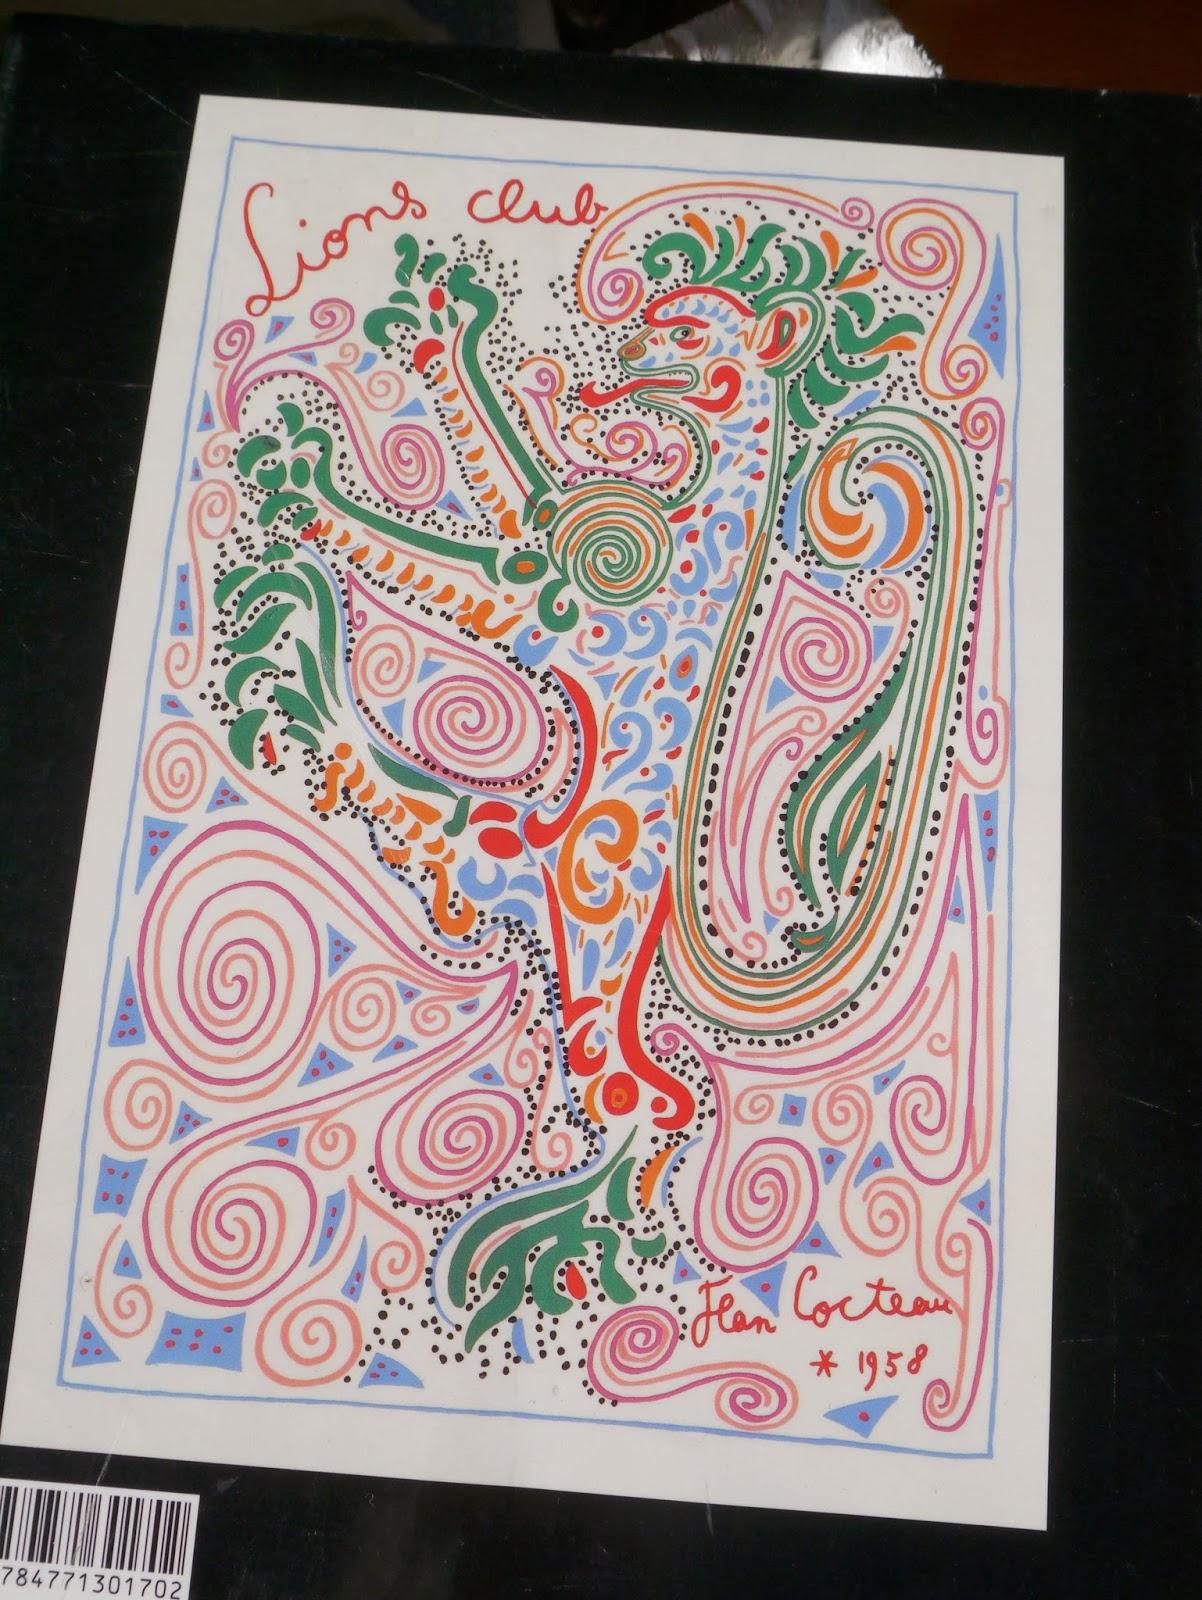 Jean Cocteau ジャンコクトー norikonakaji